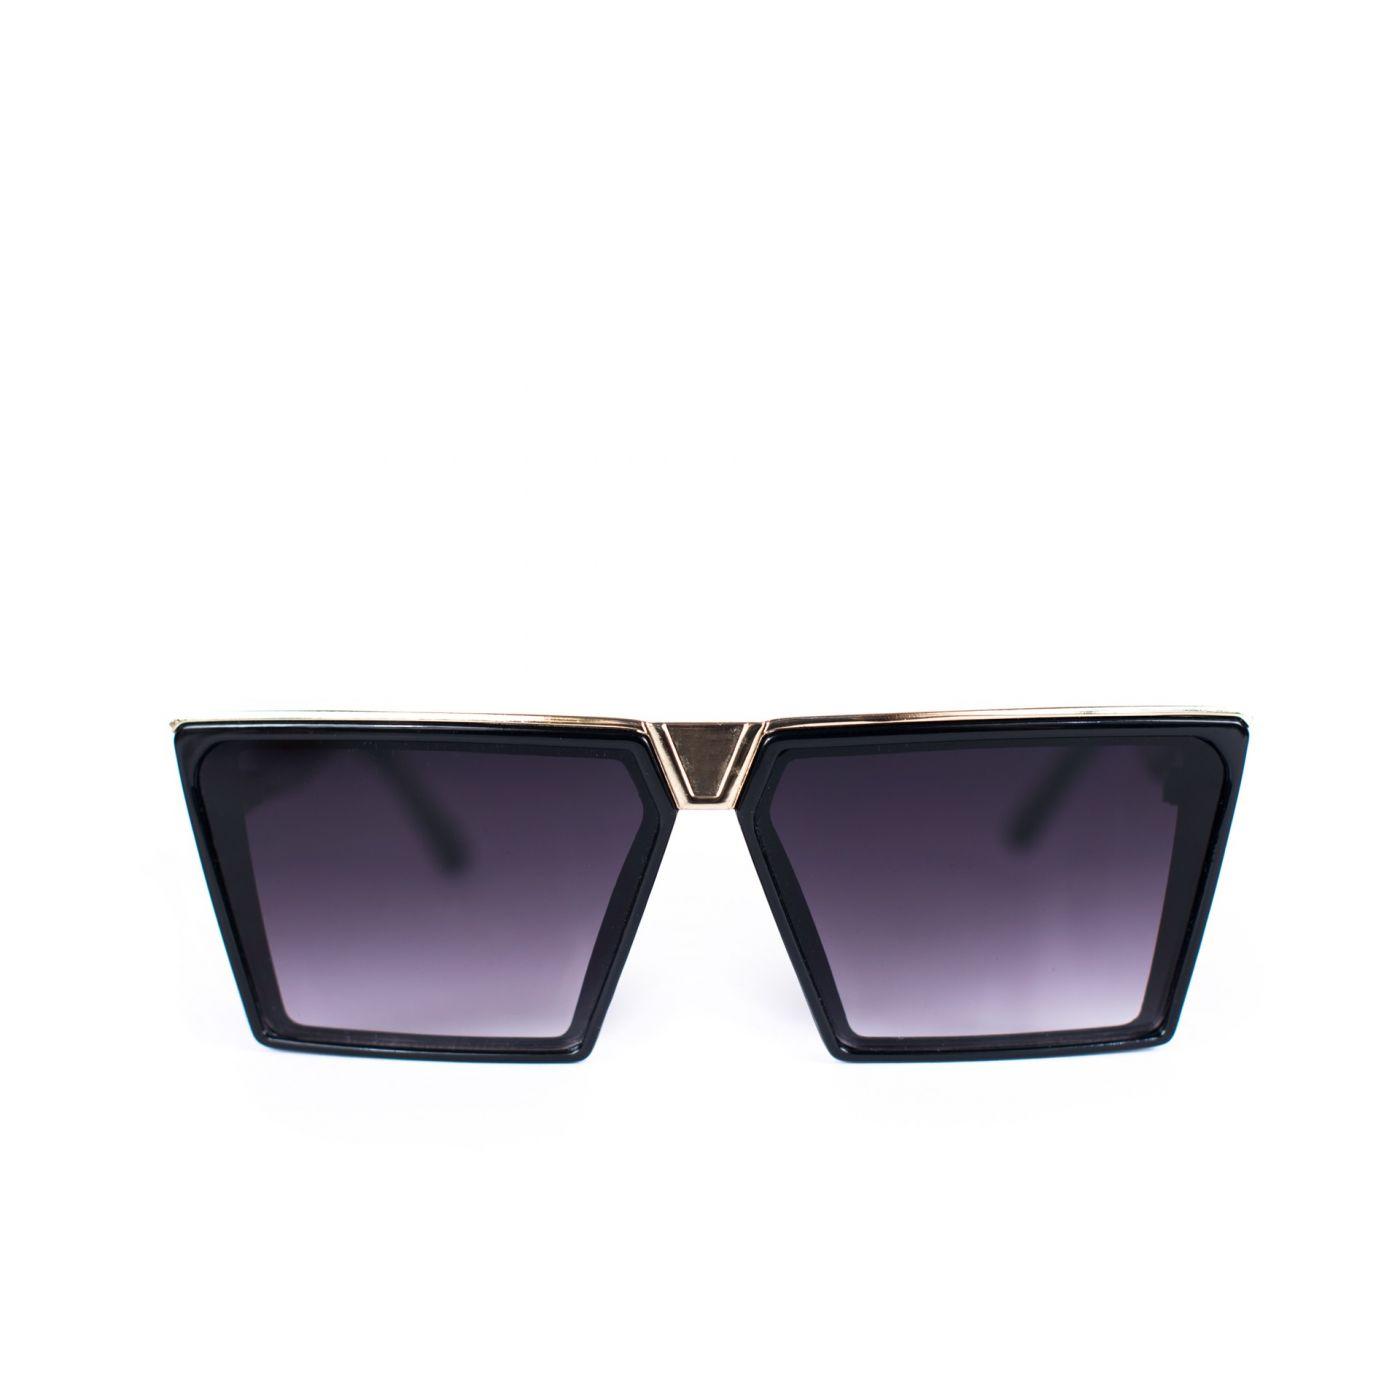 Art Of Polo Woman's Sunglasses ok19203